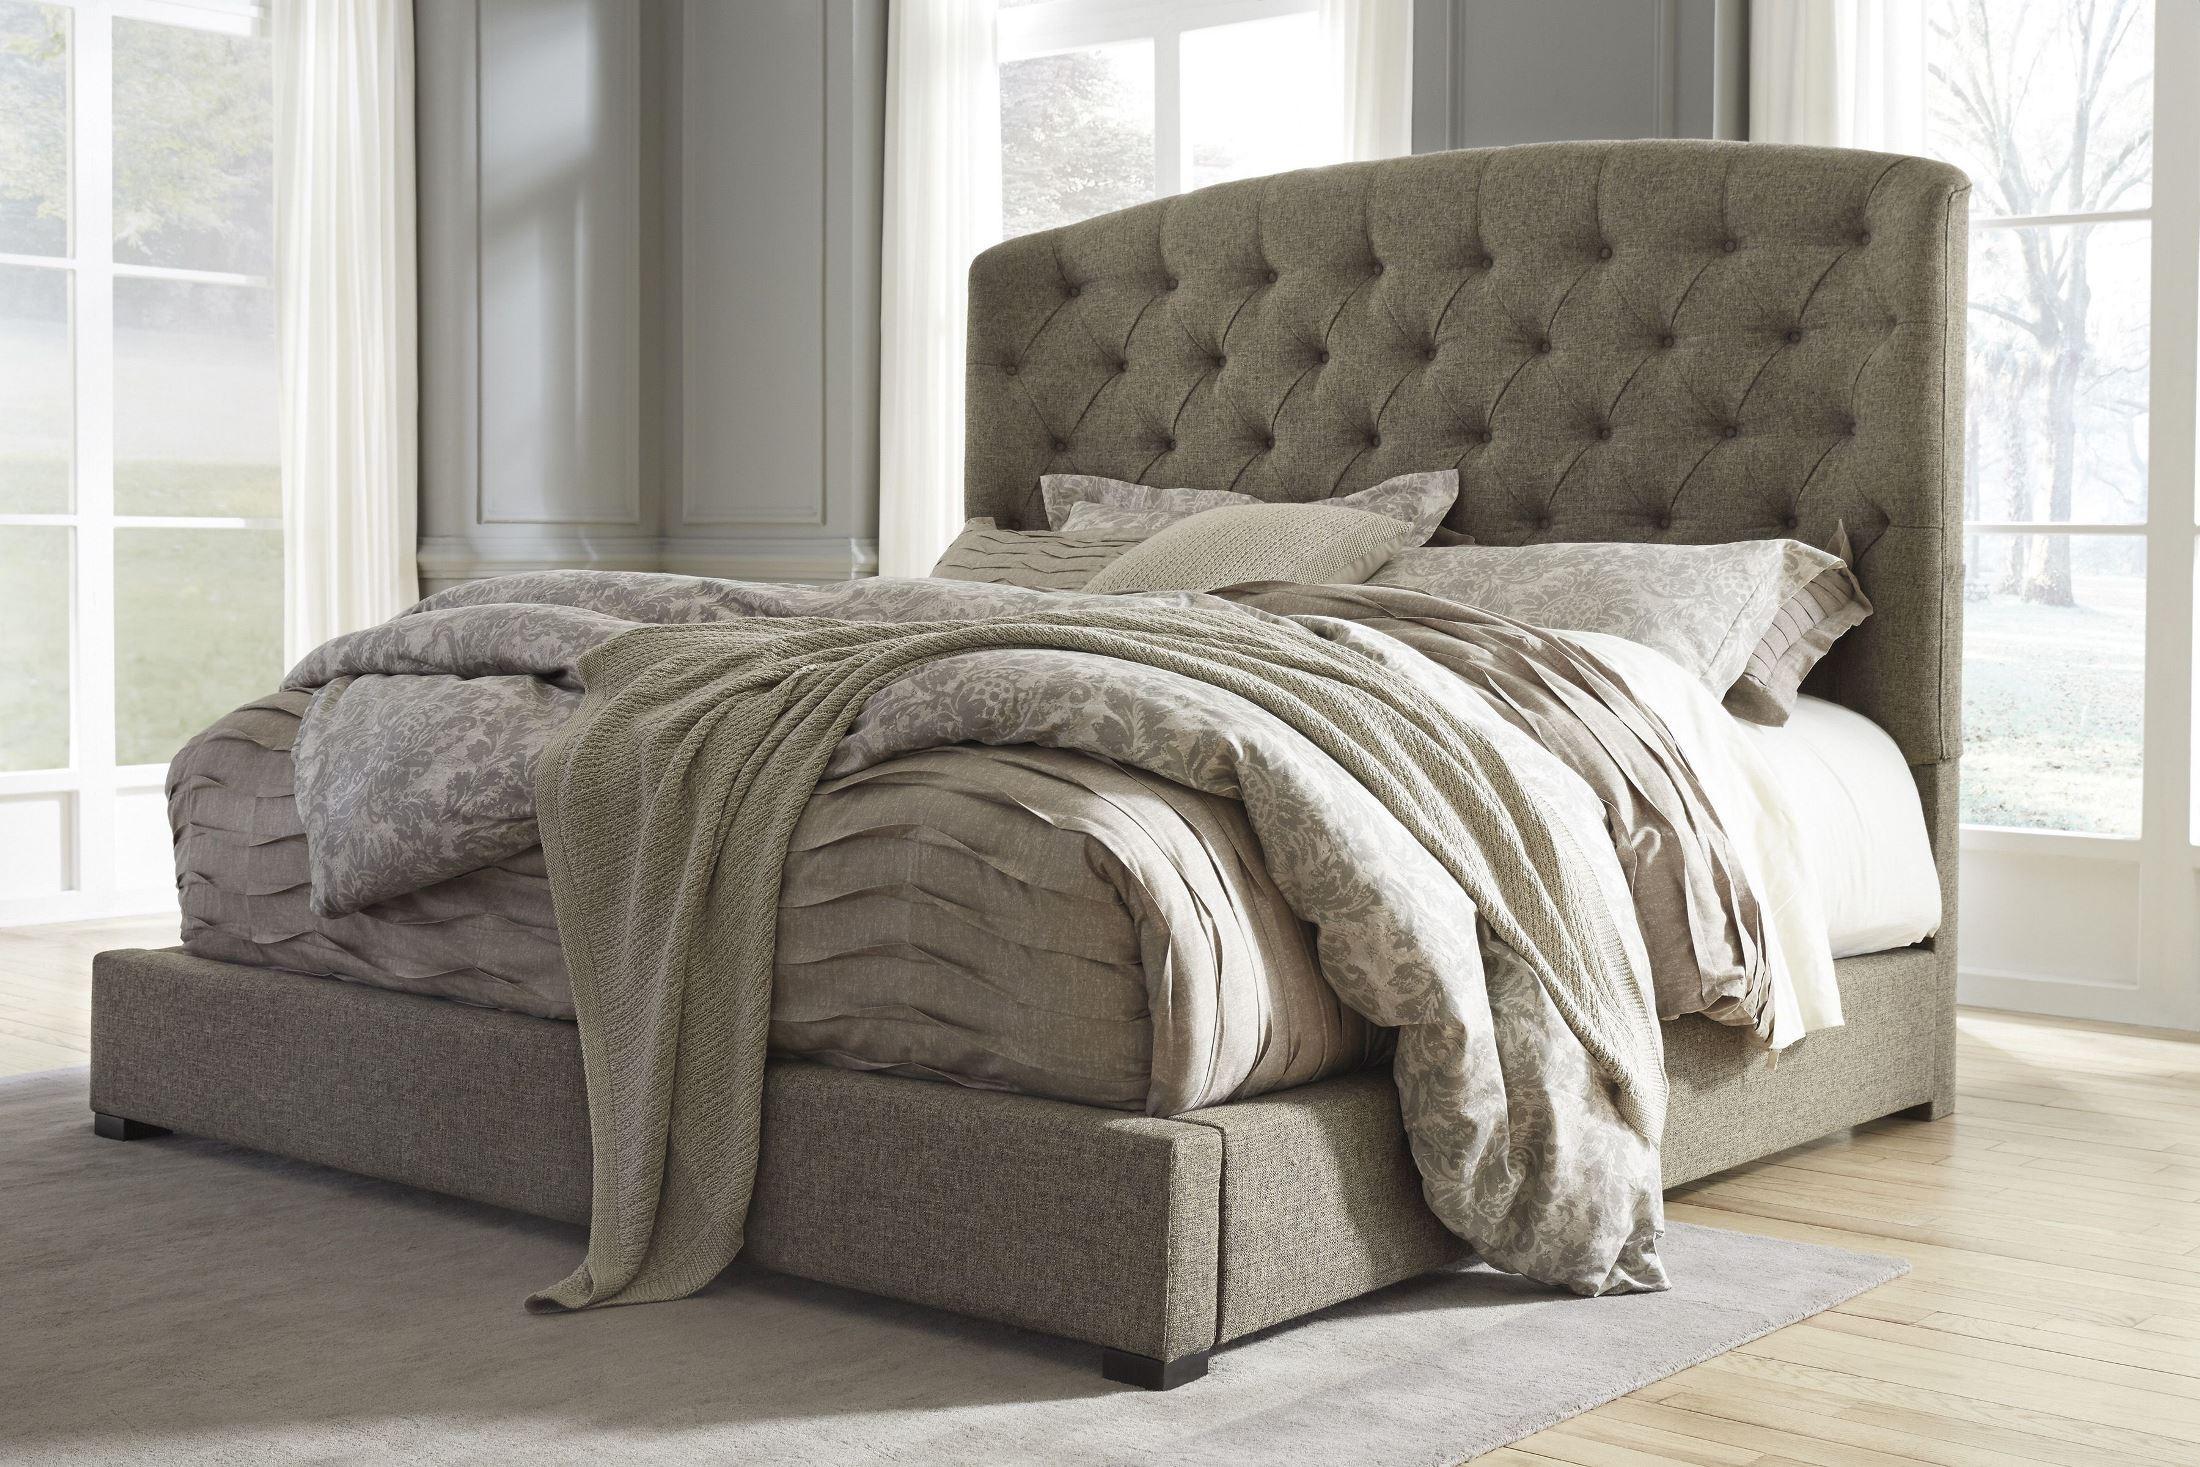 Gerlane Graphite Cal King Upholstered Panel Bed From